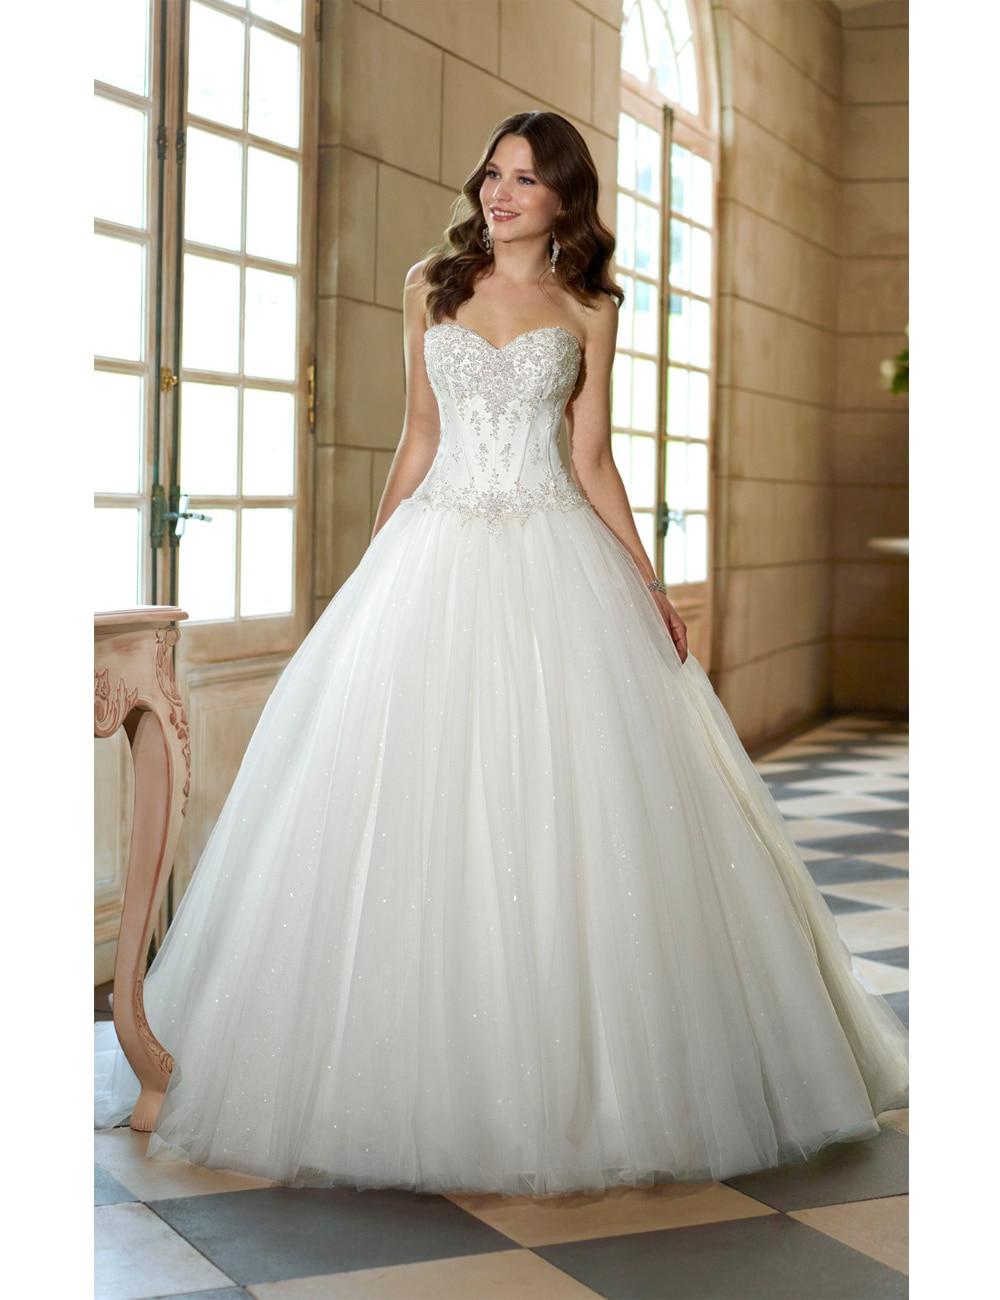 achetez en gros corset corsage robe de mari e en ligne